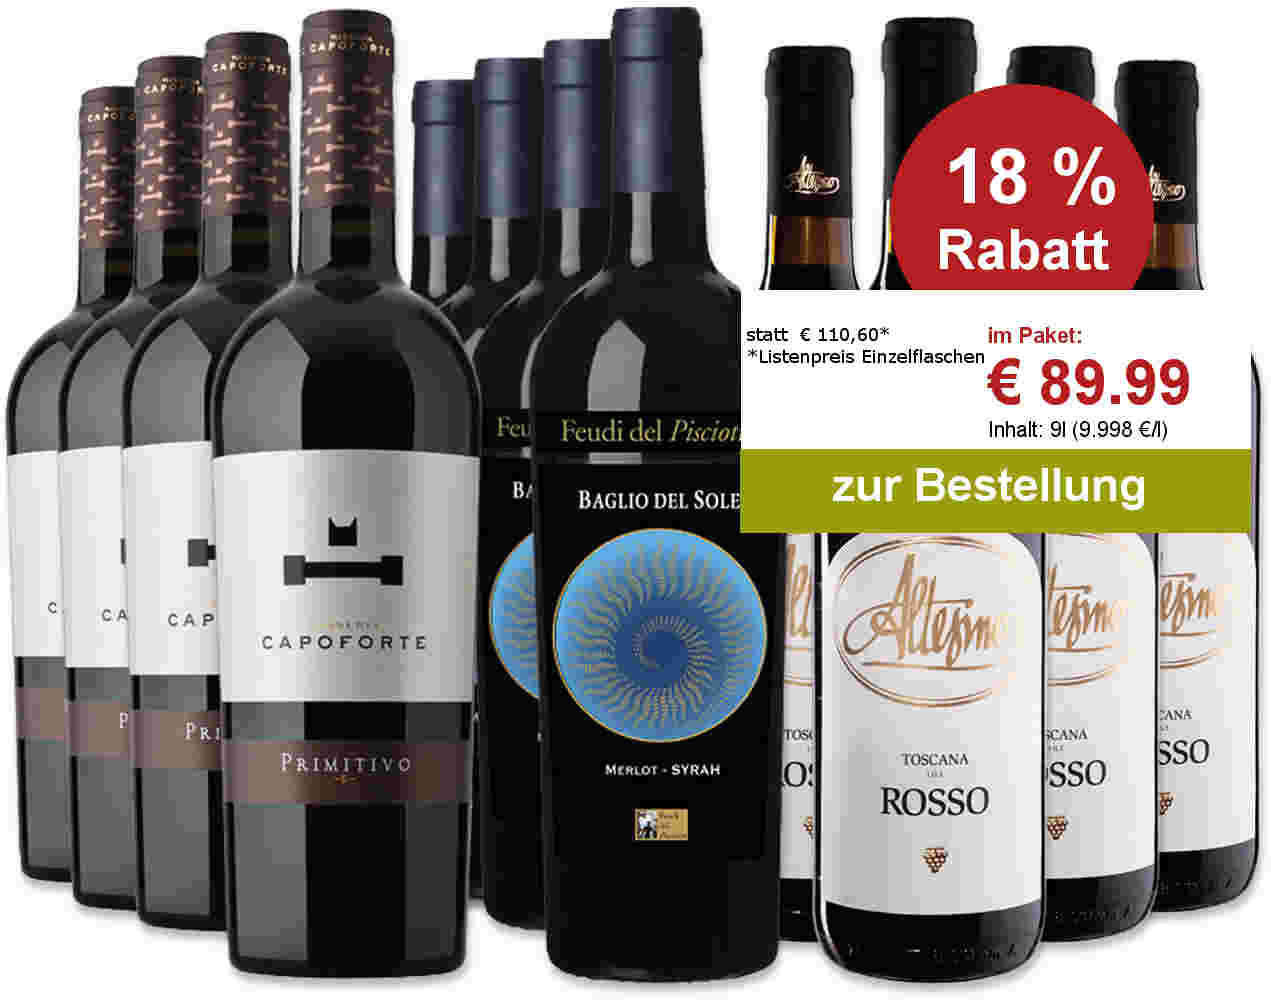 12er-capo-baglio-altesino-Angebotspreis